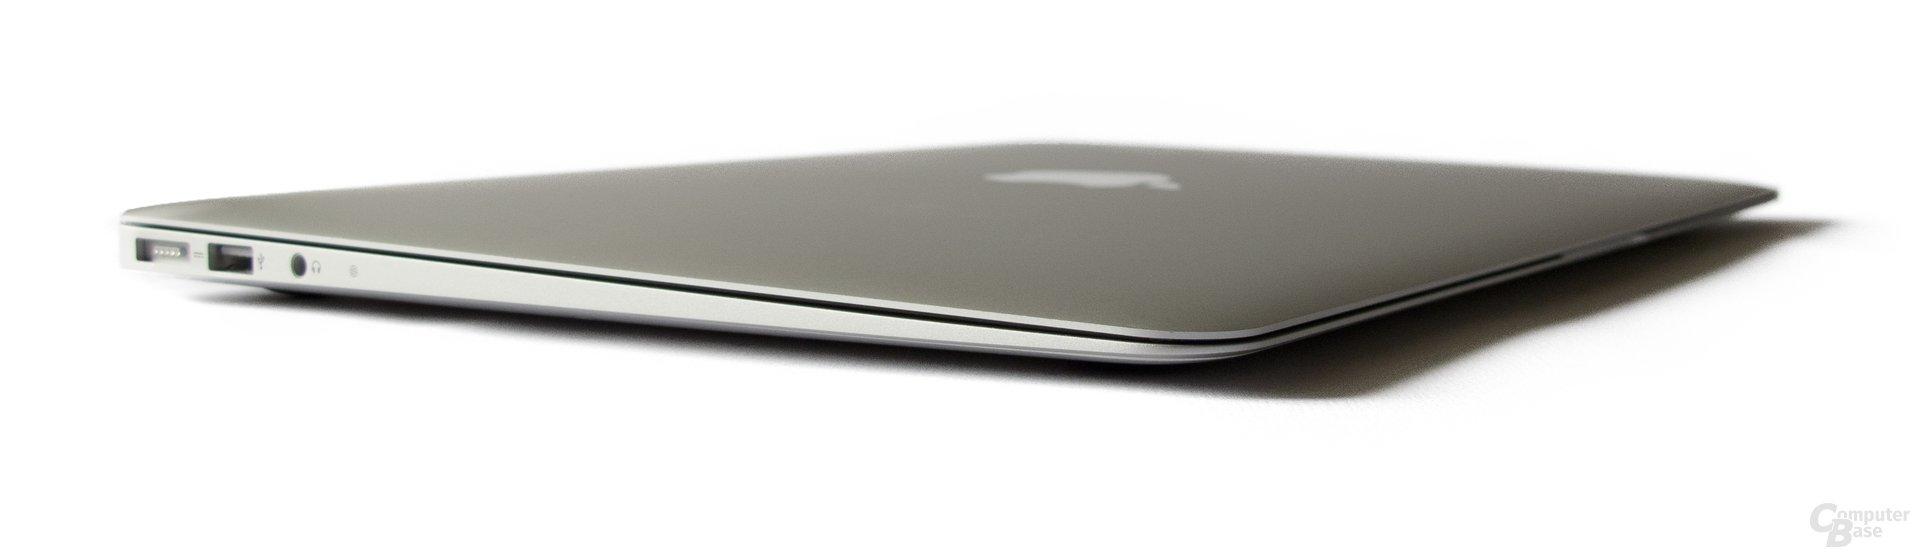 Die klassische Keilform des MacBook Air